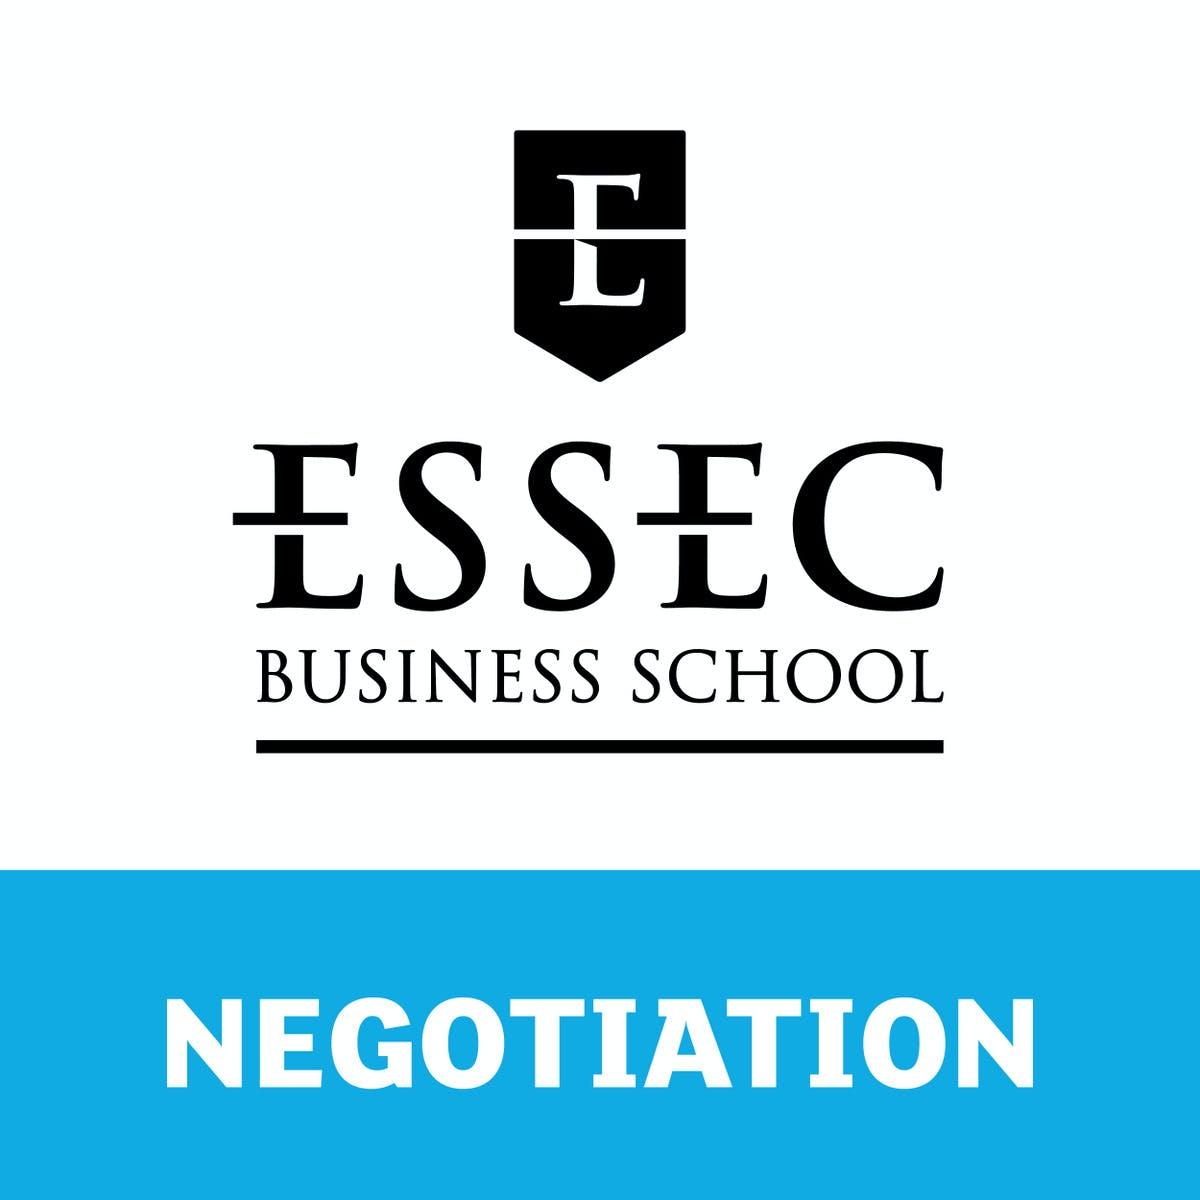 International and Cross-Cultural Negotiation